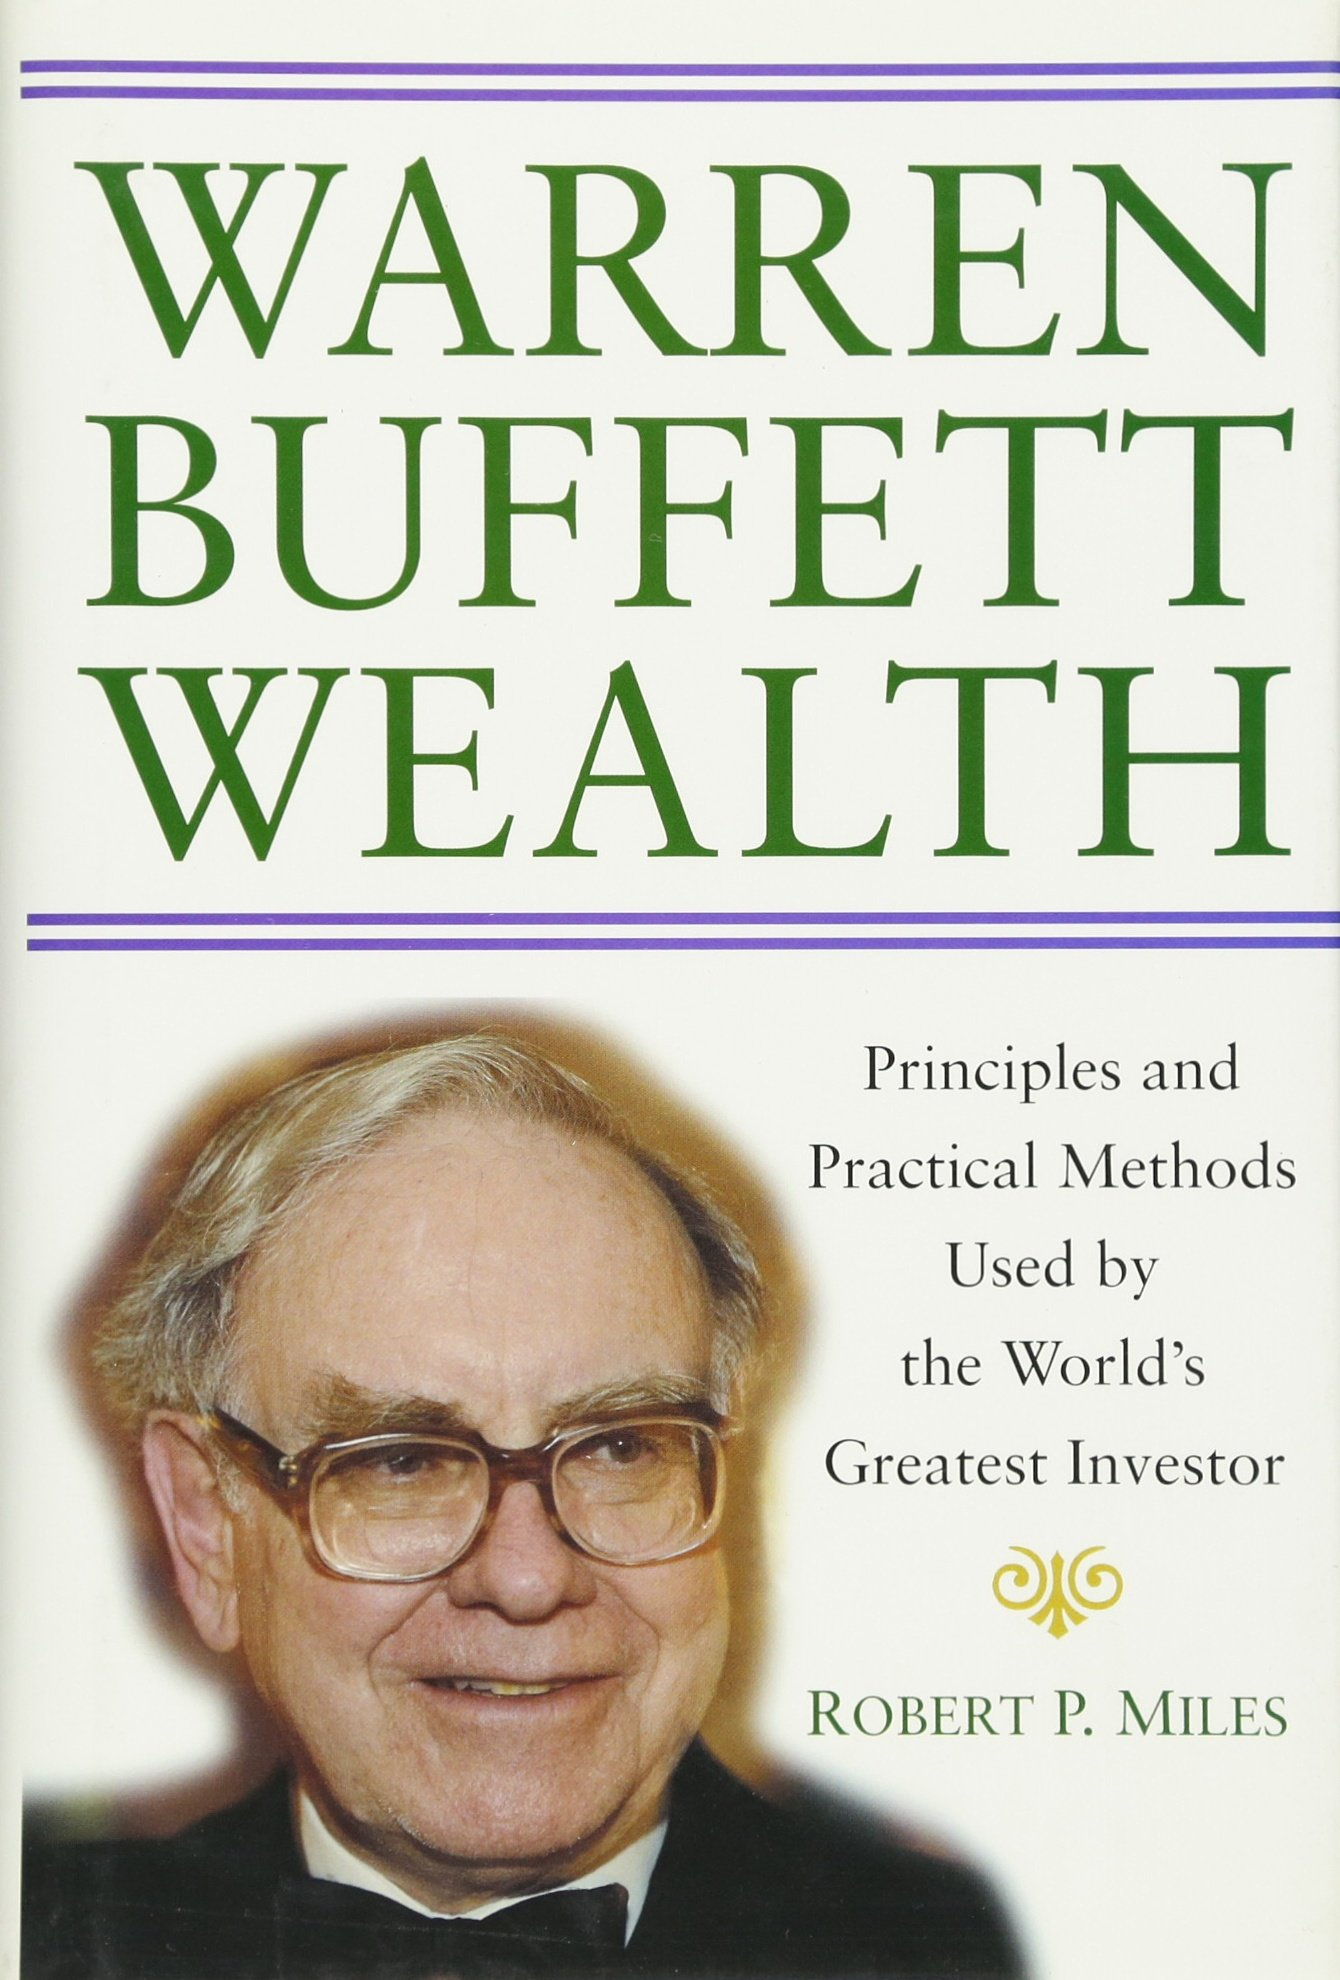 Enjoyable Warren Buffett Wealth Principles And Practical Methods Used Home Interior And Landscaping Ferensignezvosmurscom